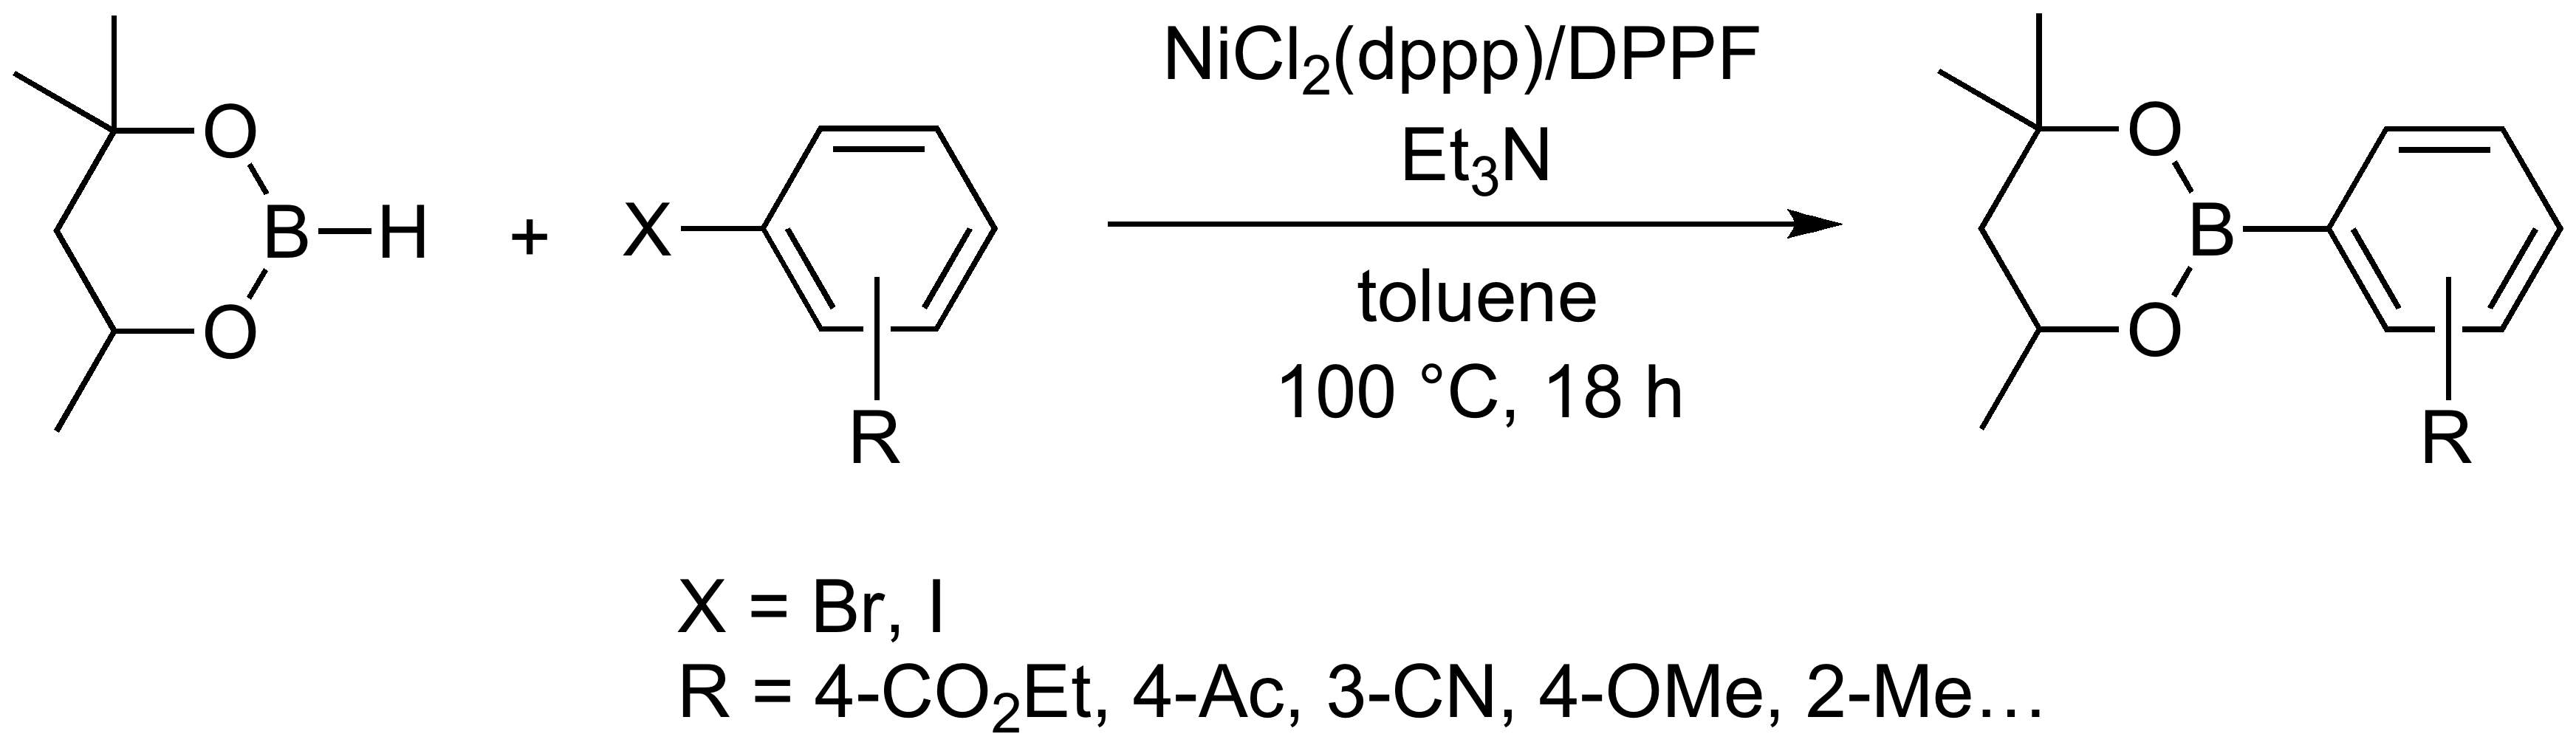 catalyzed olefin metathesis